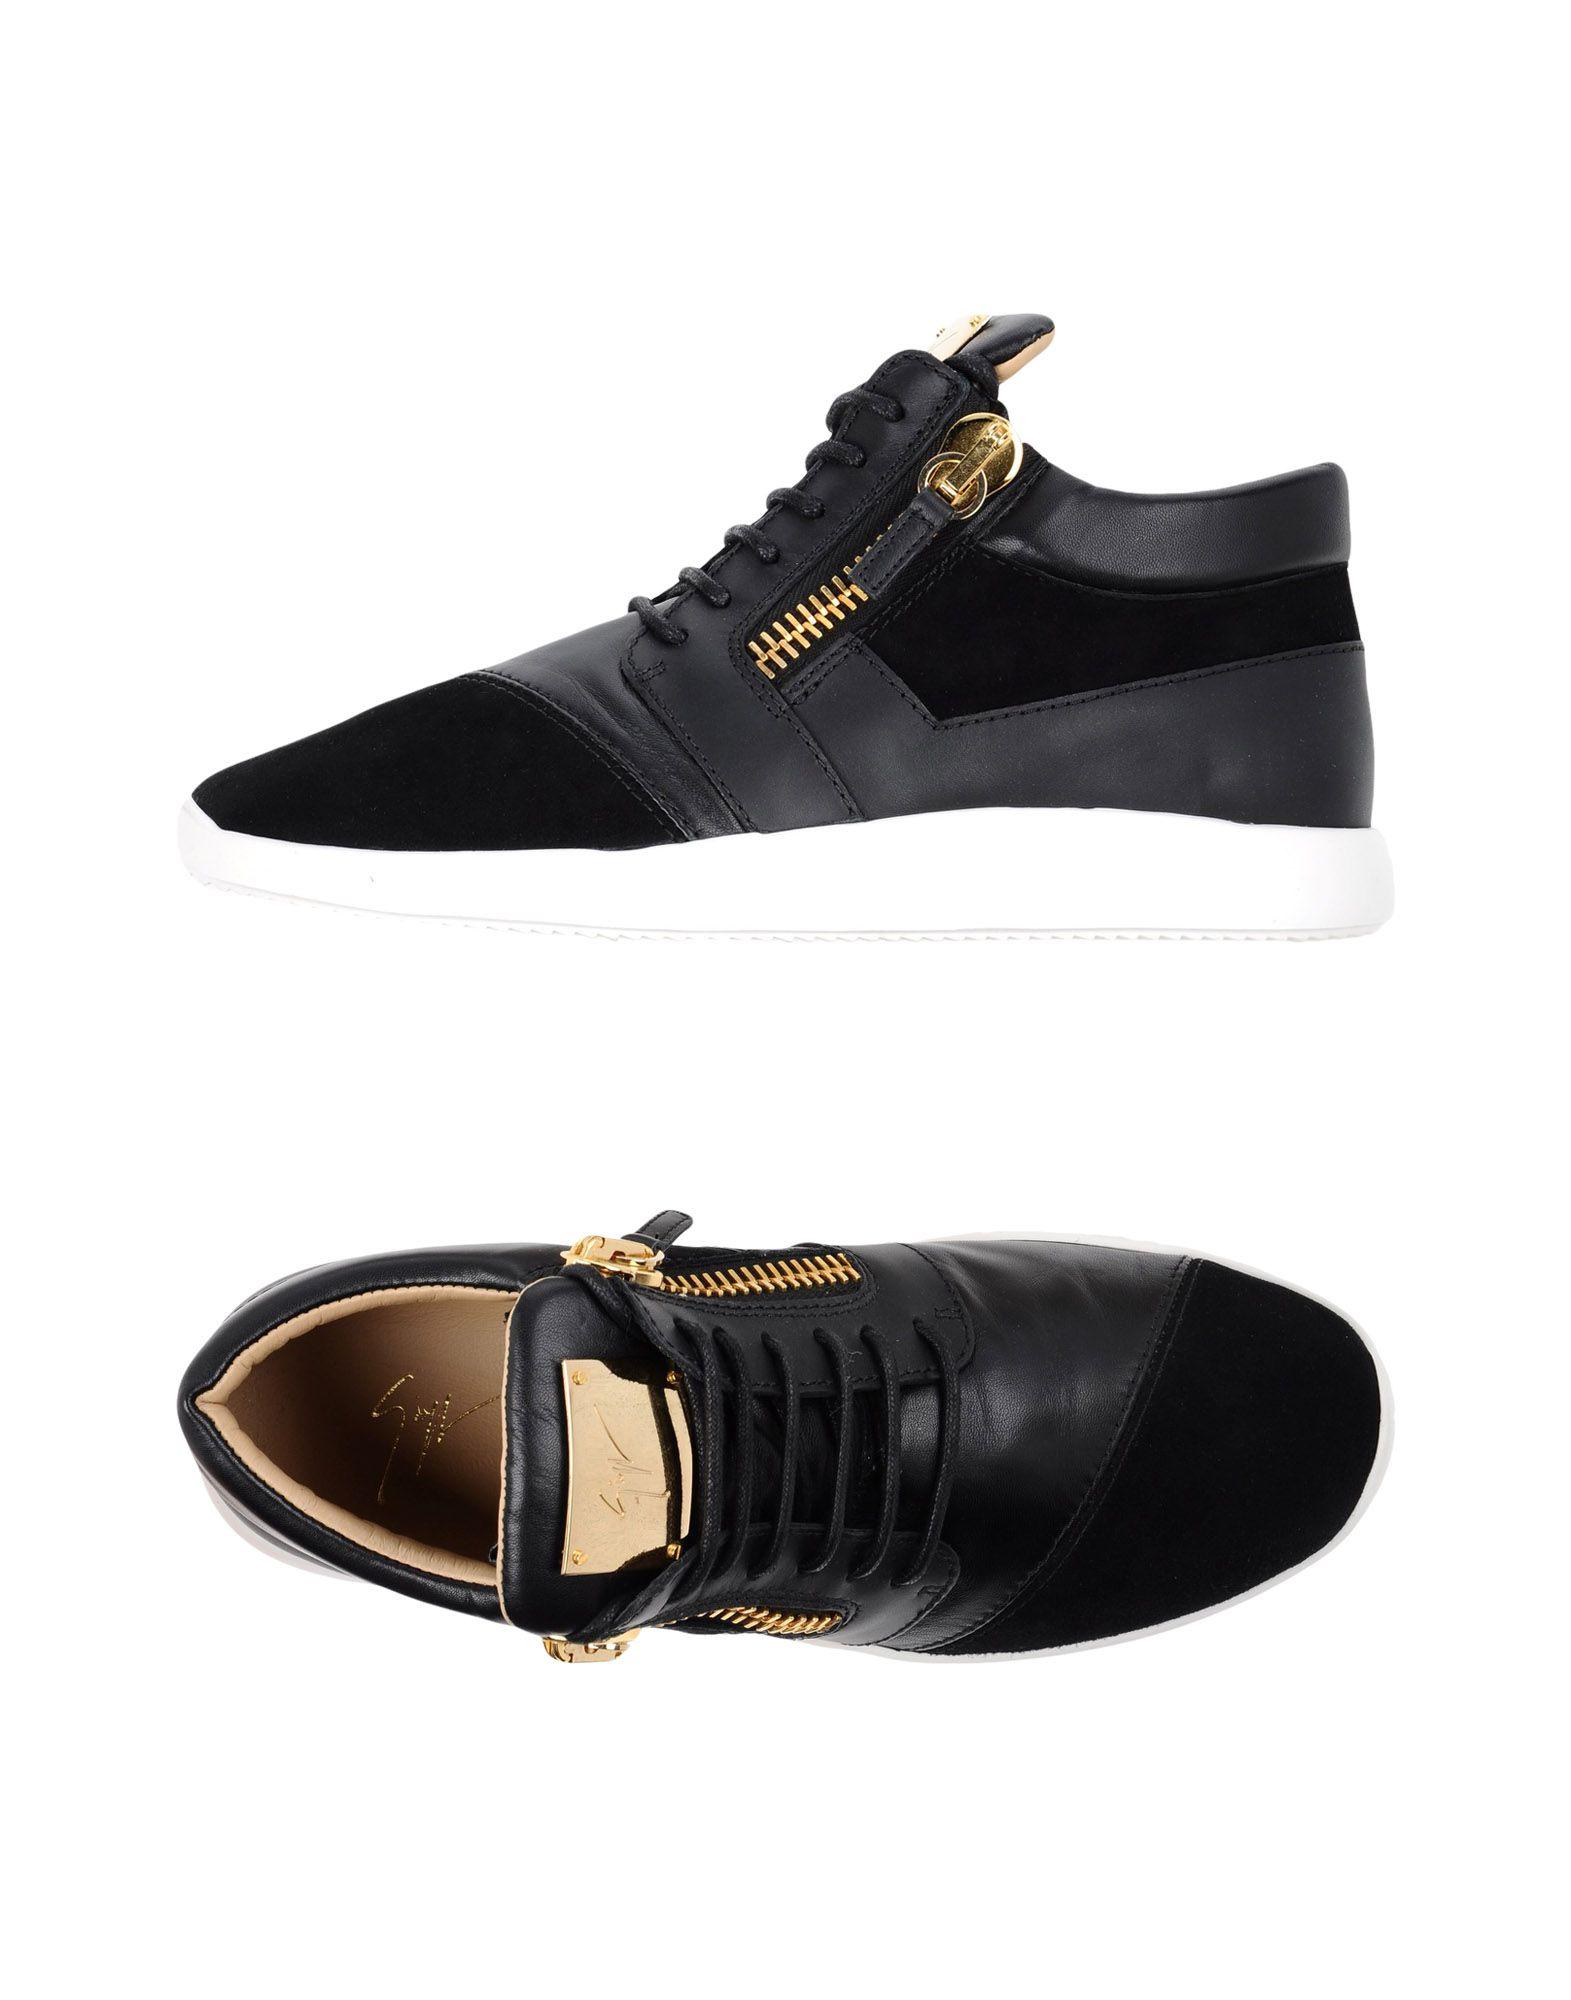 Giuseppe Zanotti Sneakers Herren  11365230OR Gute Qualität beliebte Schuhe